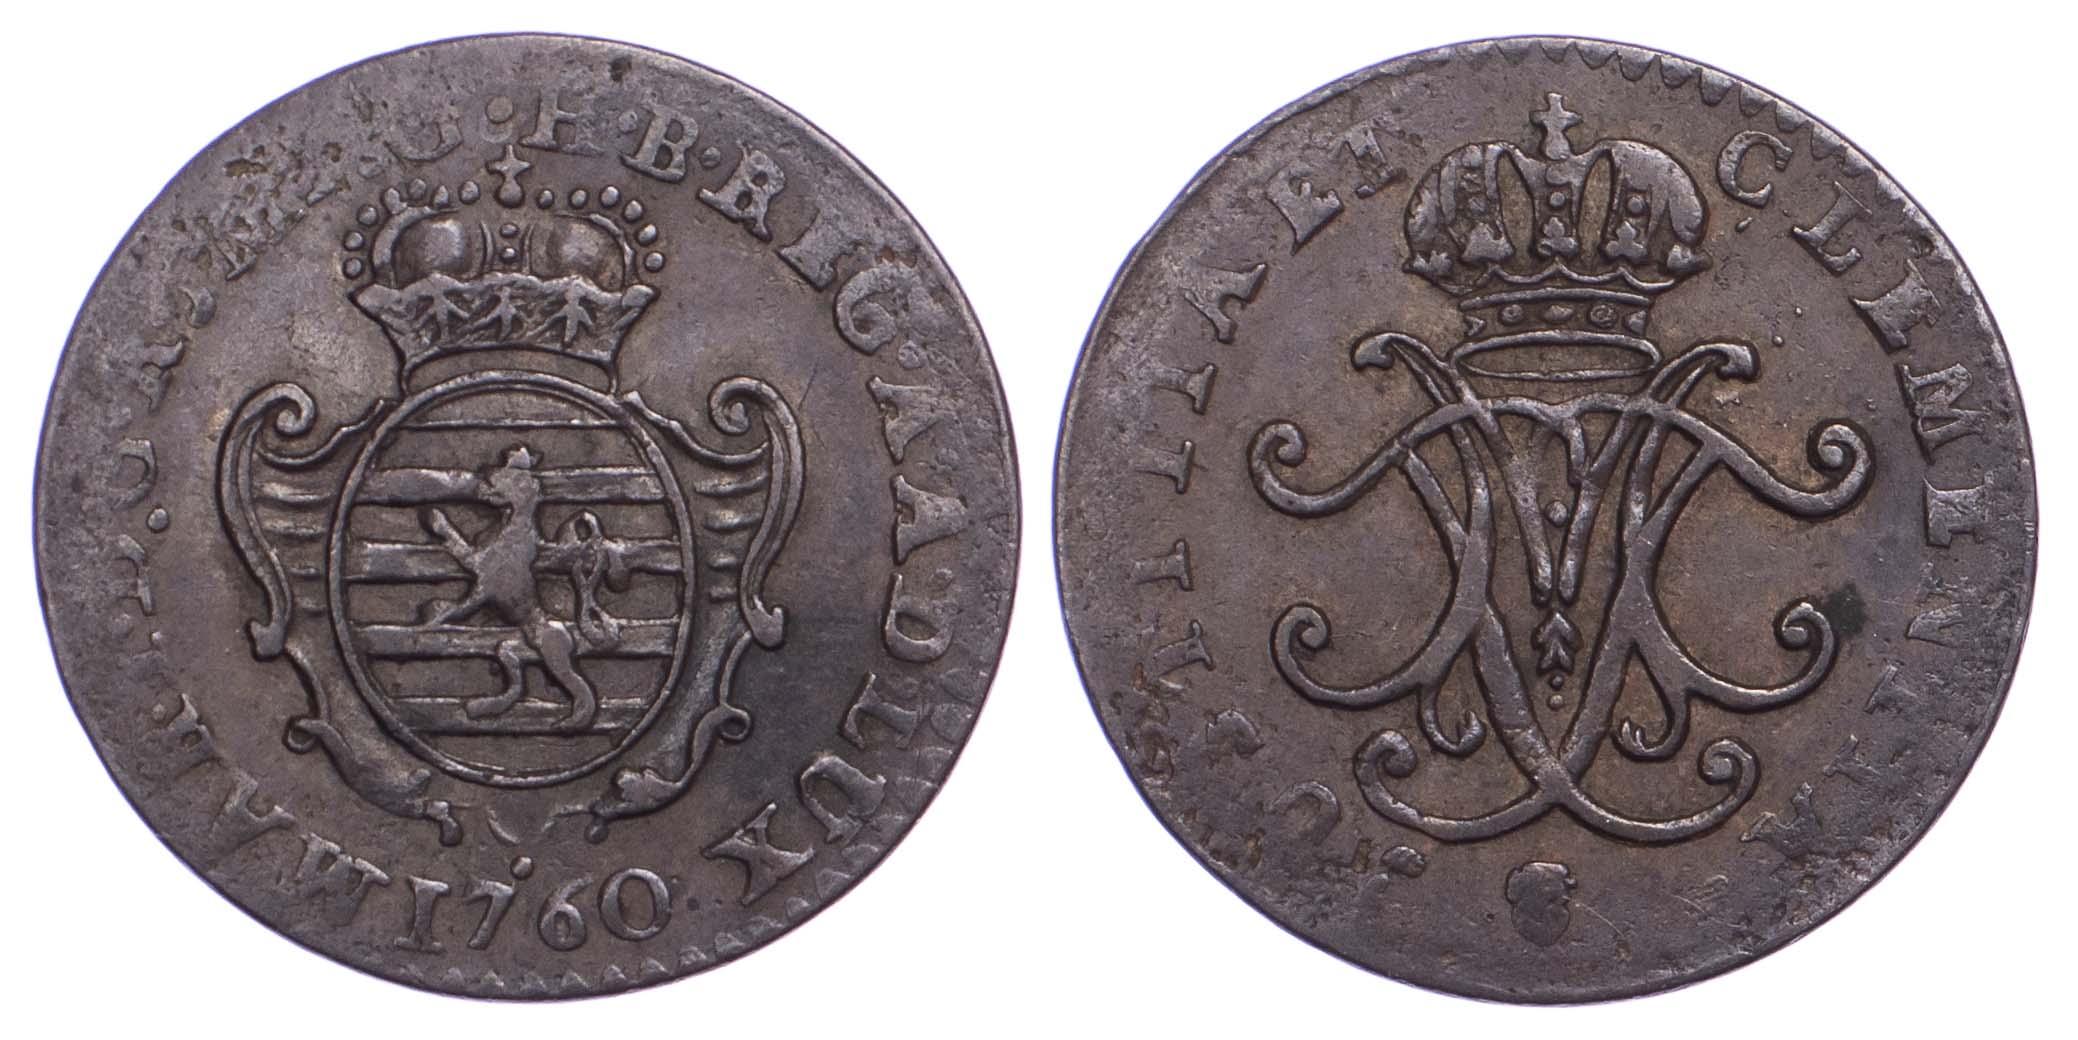 Luxembourg, Grand Duchy, Maria Theresa (1740-1780), Copper Liard (1760)